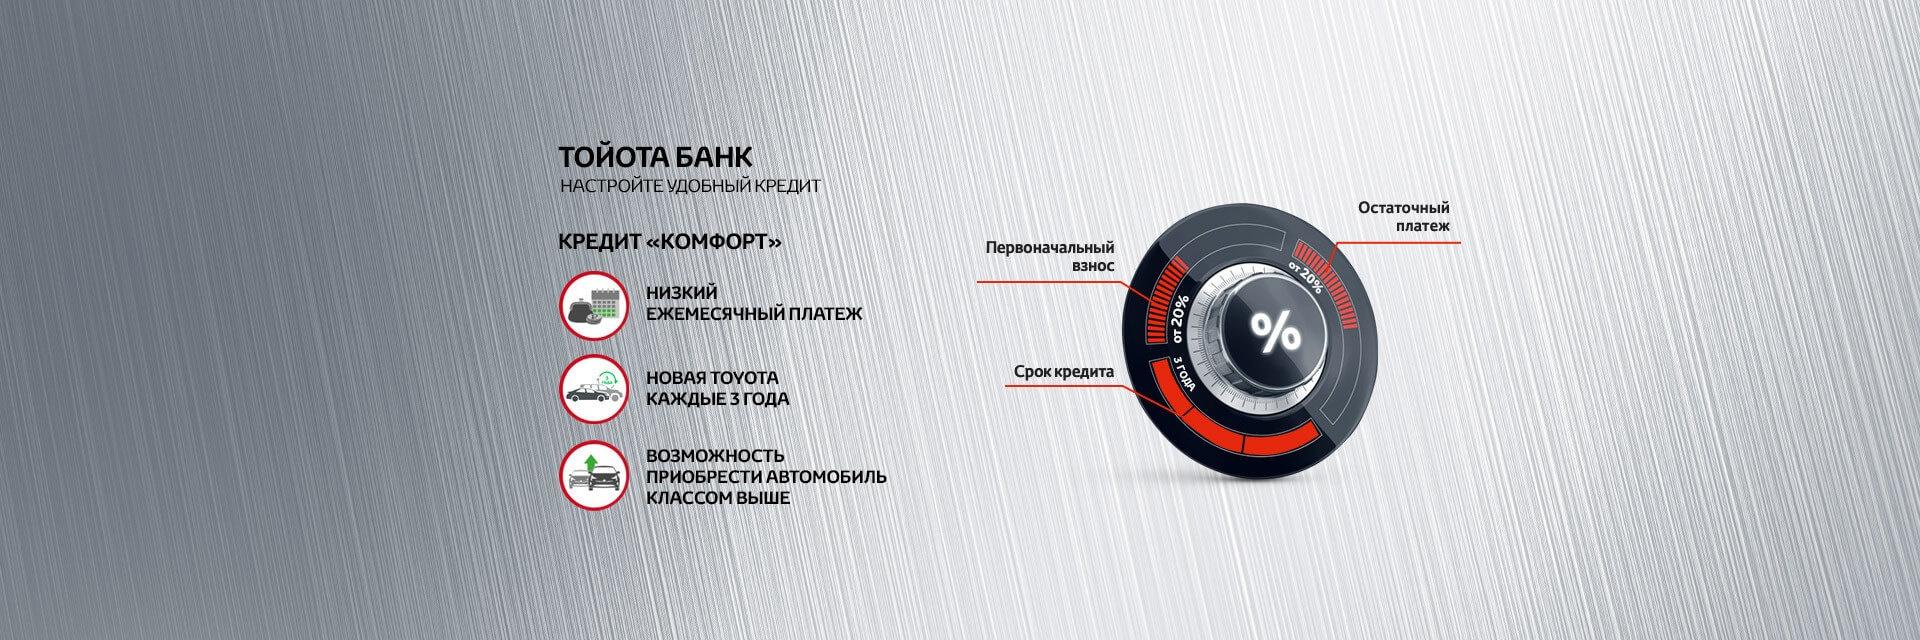 кредит в долларах банки